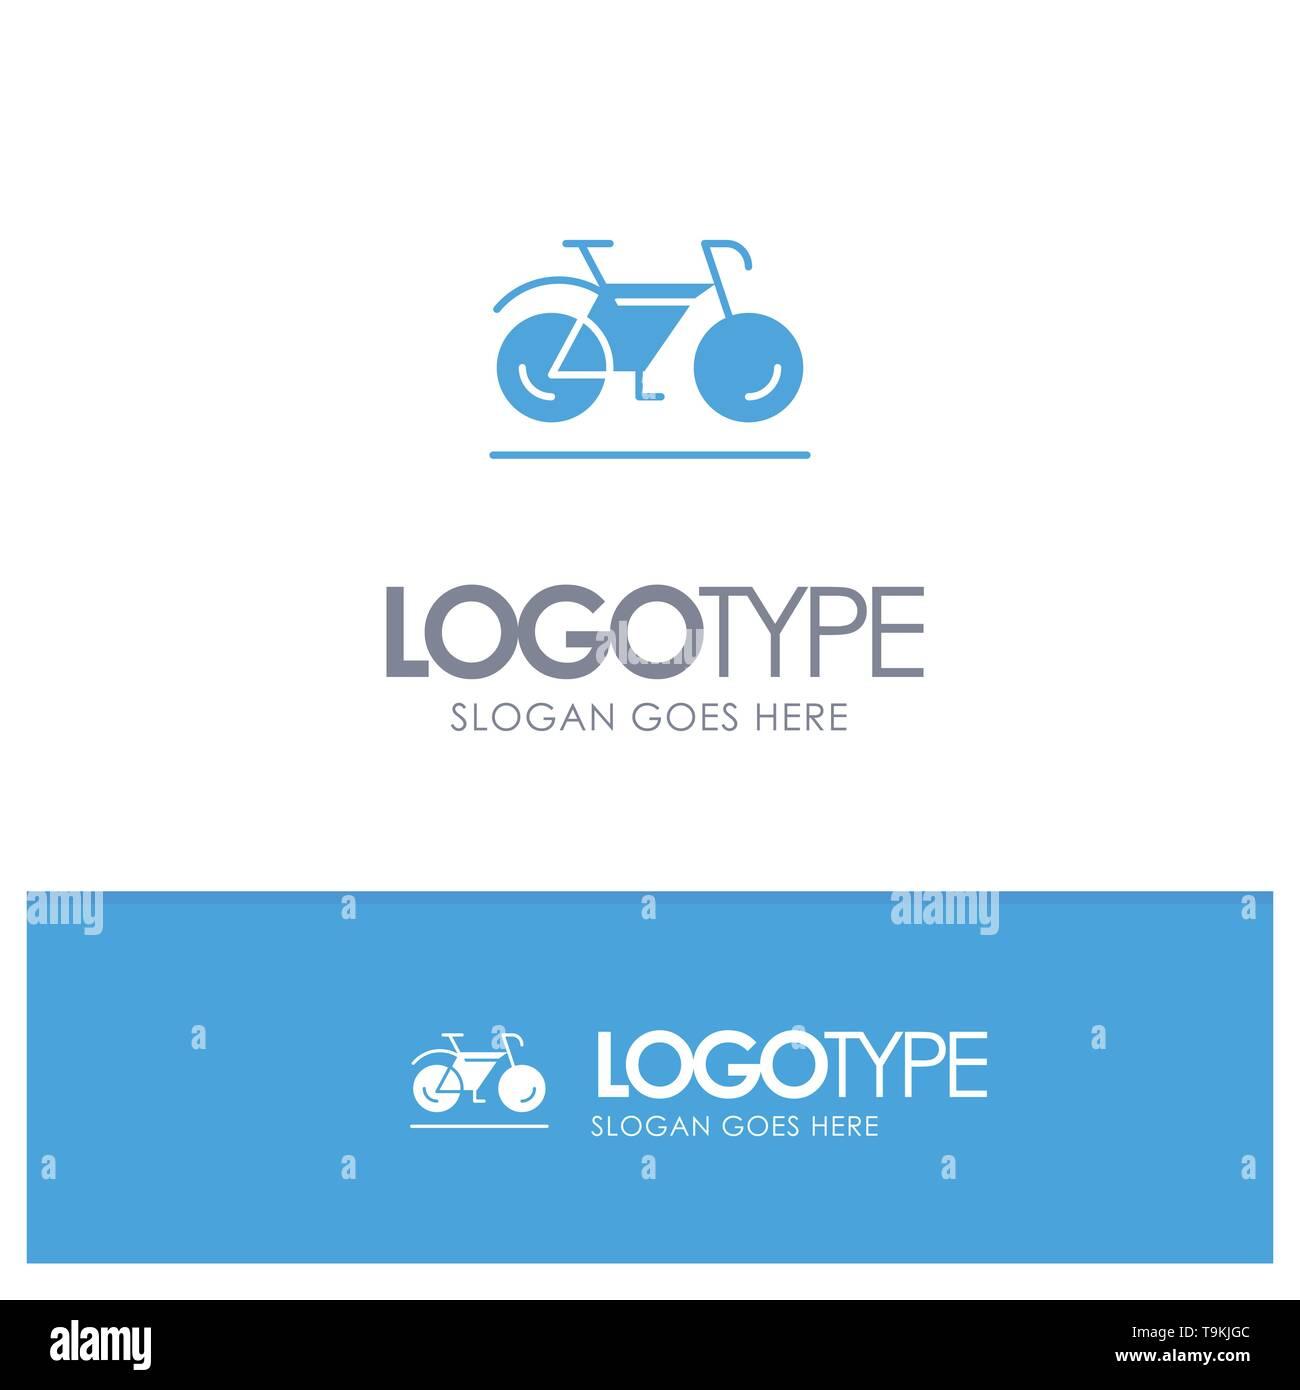 Bicycle, Movement, Walk, Sport Blue Logo vector - Stock Image